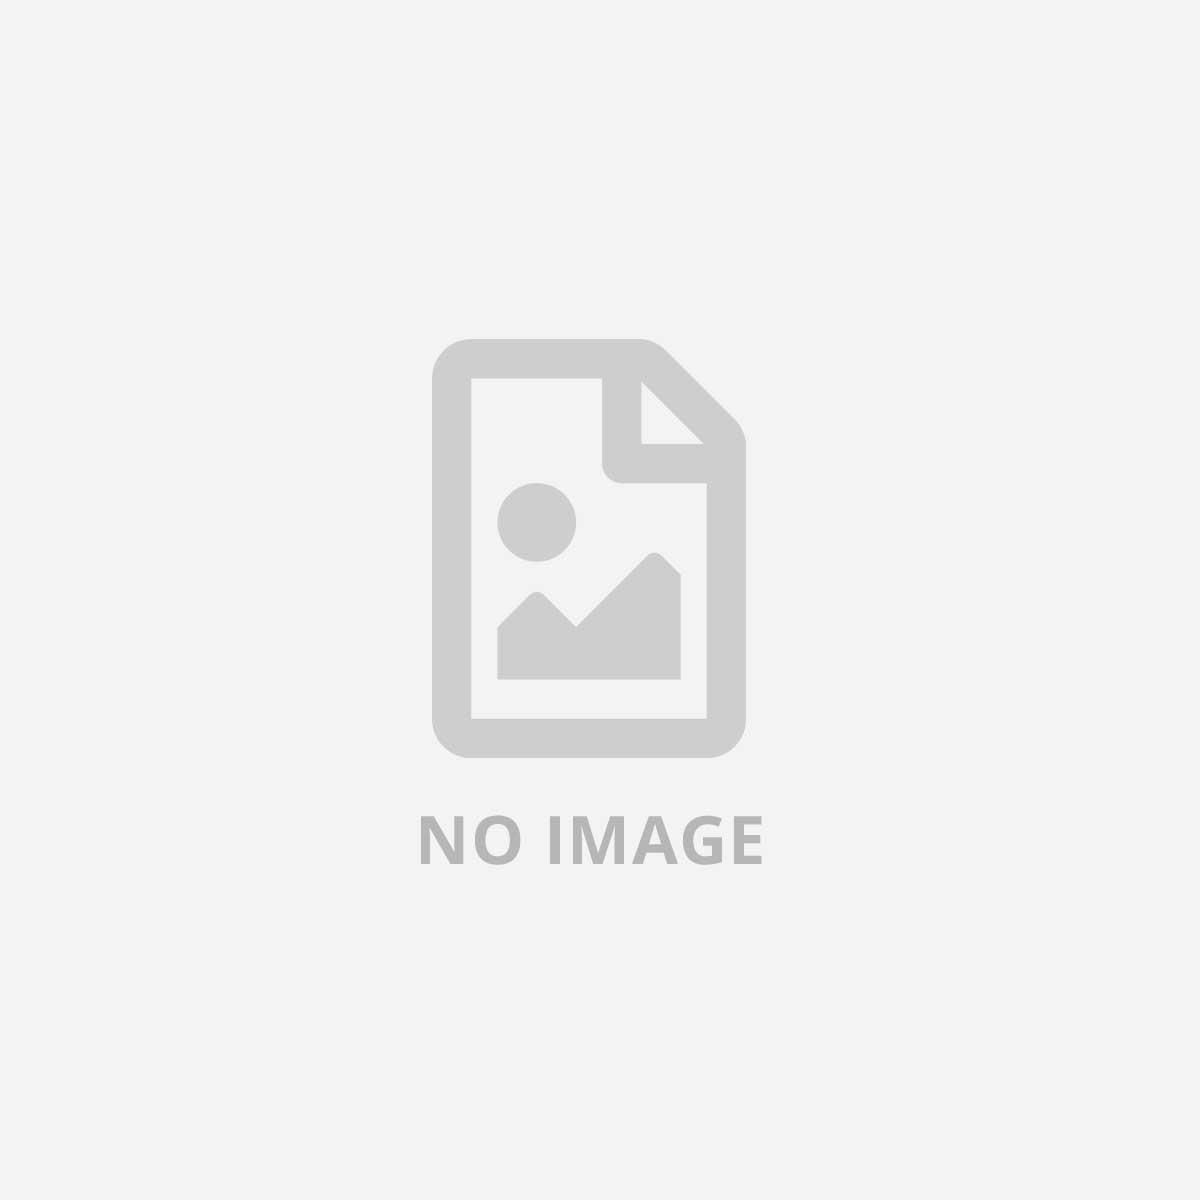 DELL KIT - 2U CPU HEATSINK FOR POWEREDGE